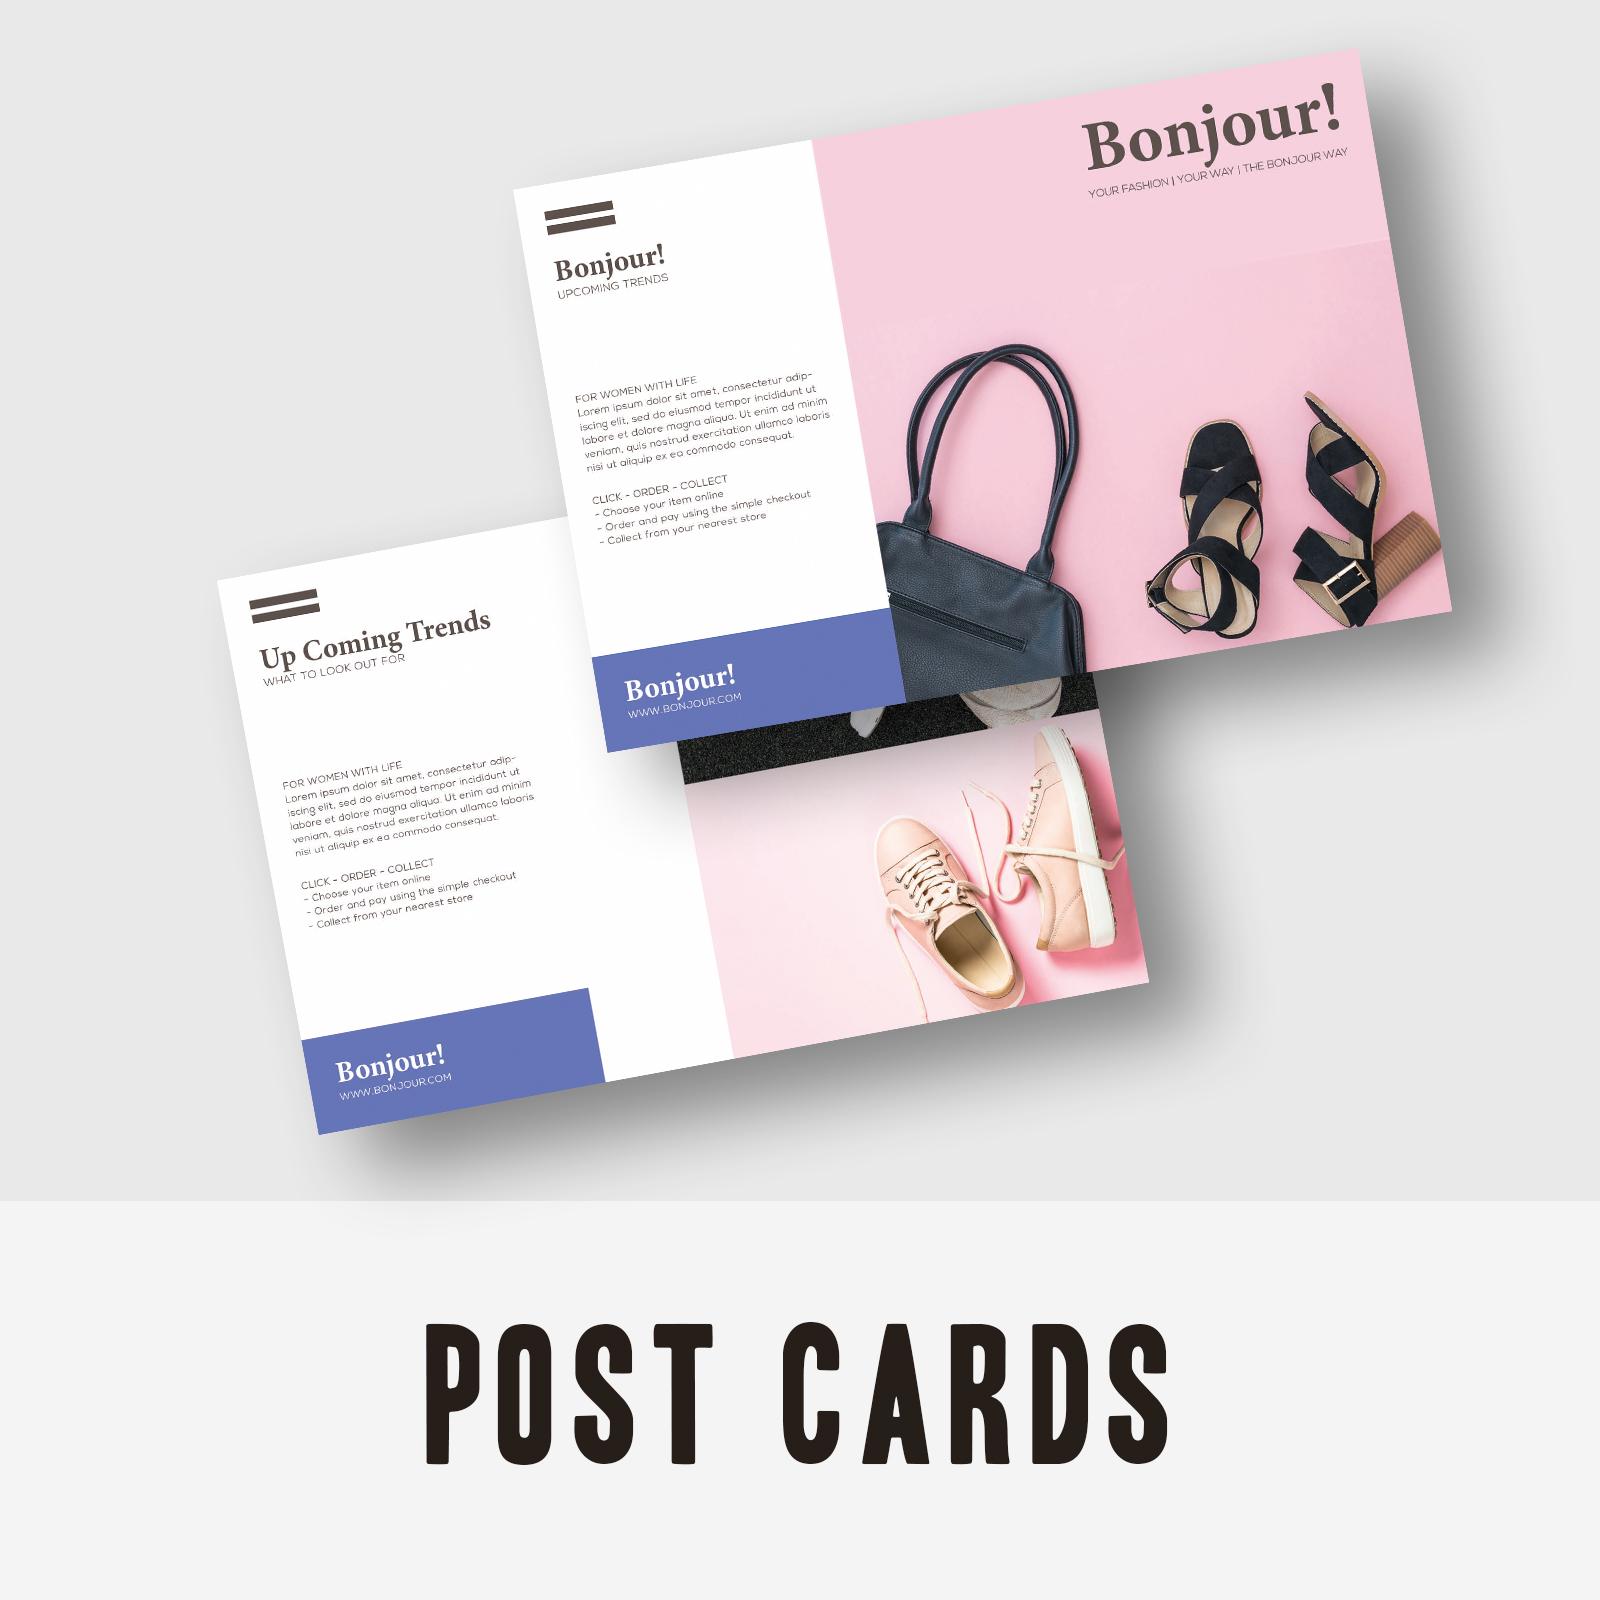 Postcards - Bonjour Clothing & Accessories